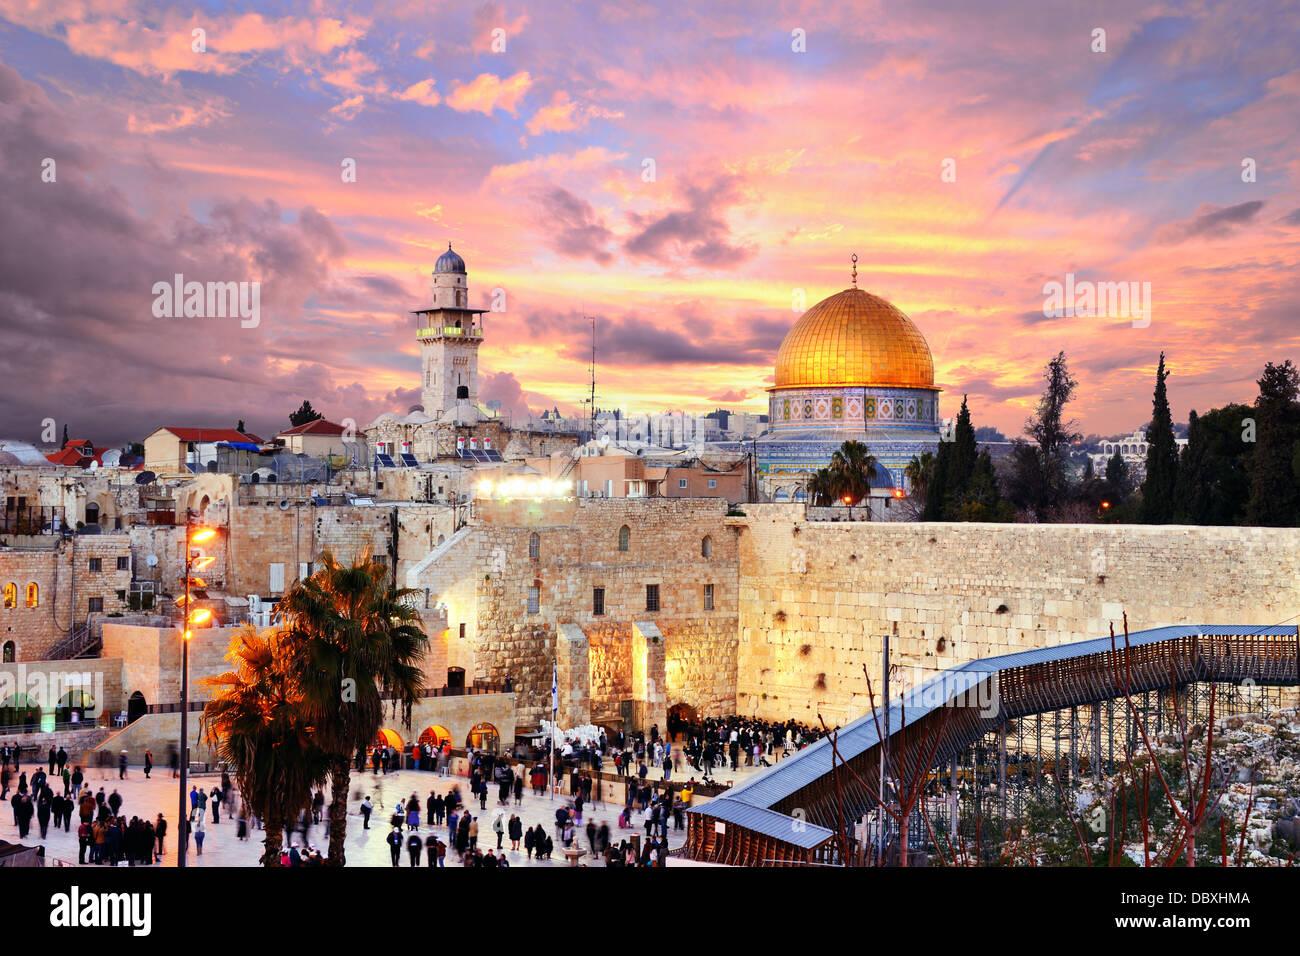 Skyline der Altstadt am er Klagemauer und Tempelberg in Jerusalem, Israel. Stockbild